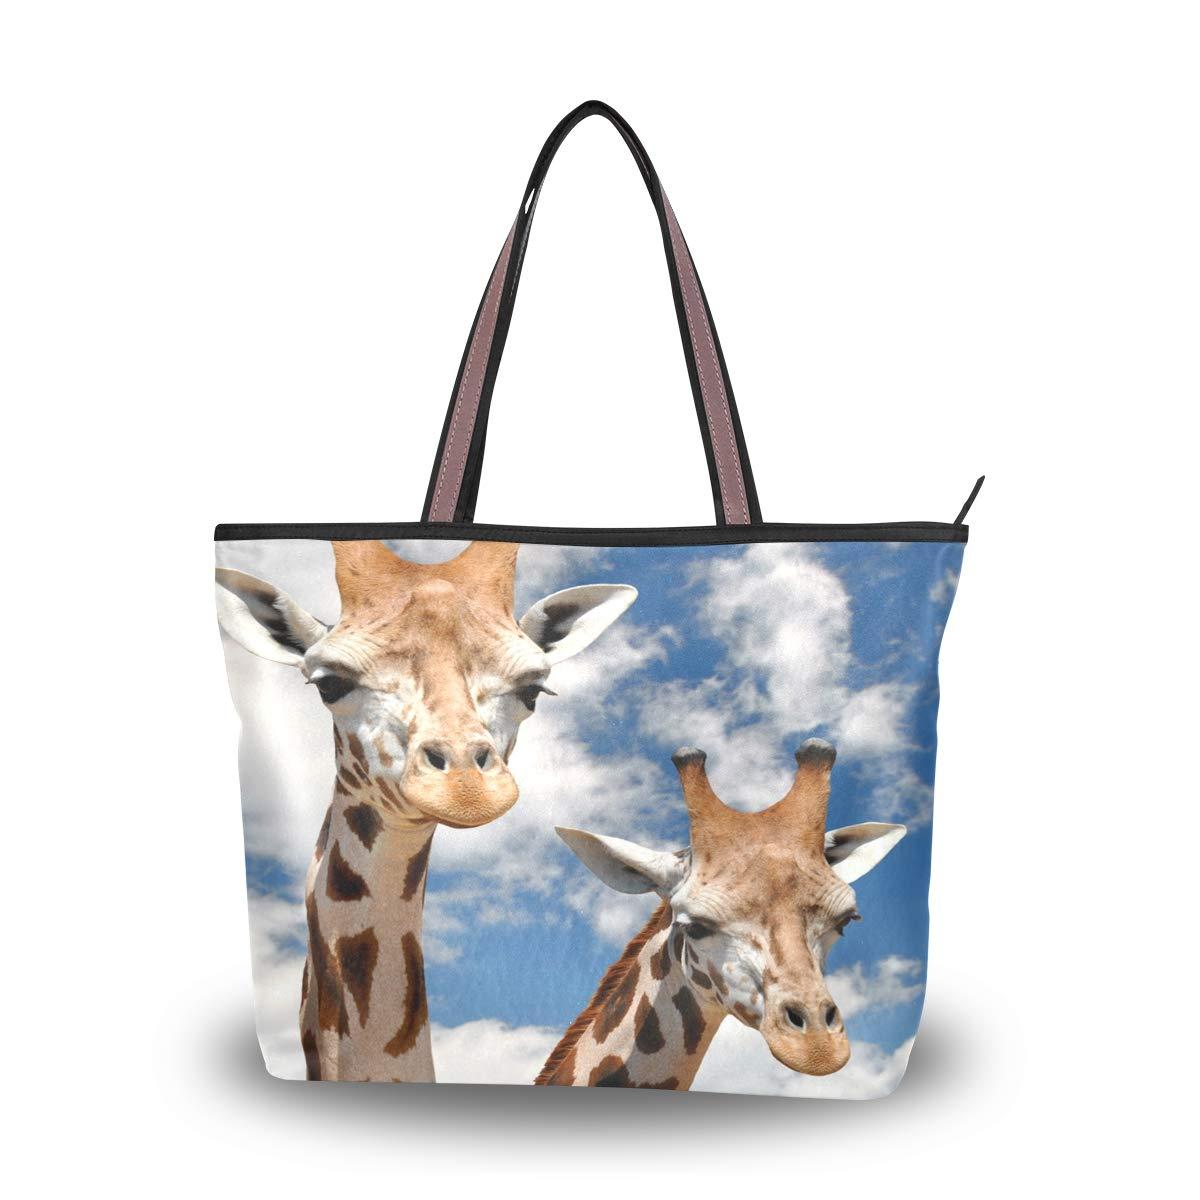 Zip Tote Bag Giraffes Blue Sky Womens Handbags Shoulder Bags Satchel Purse